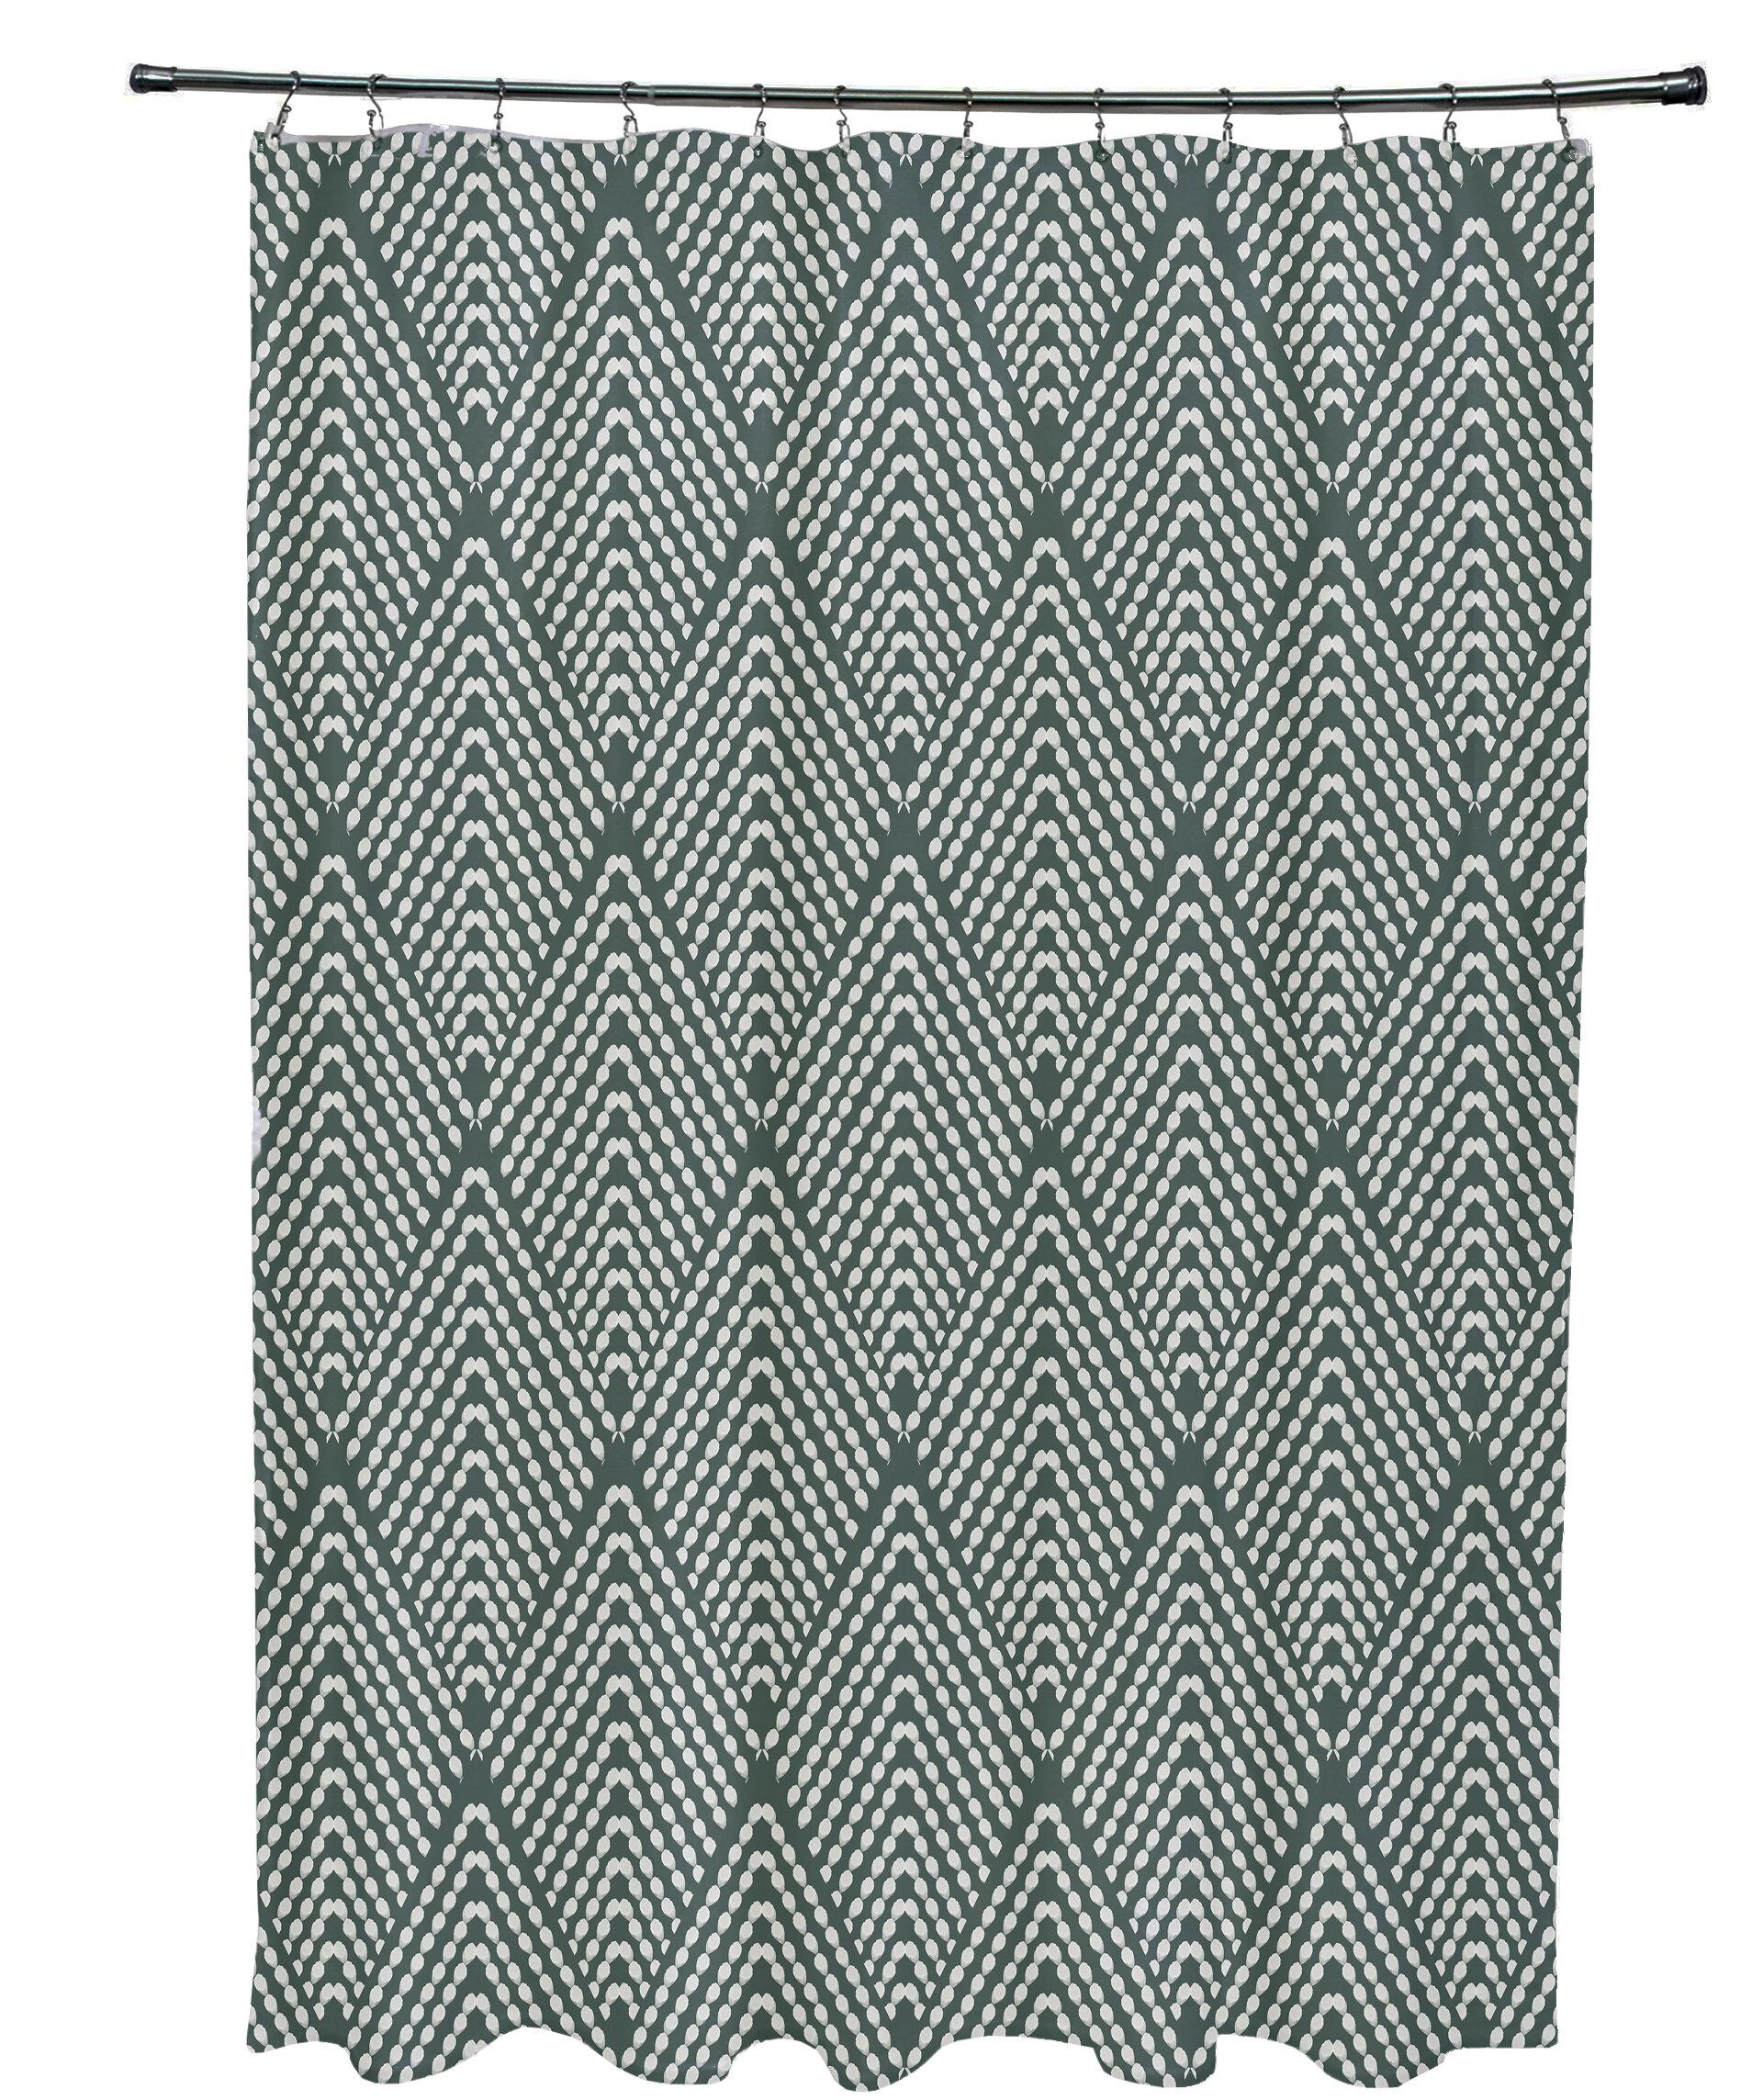 Mistana Leia Geometric Shower Curtain